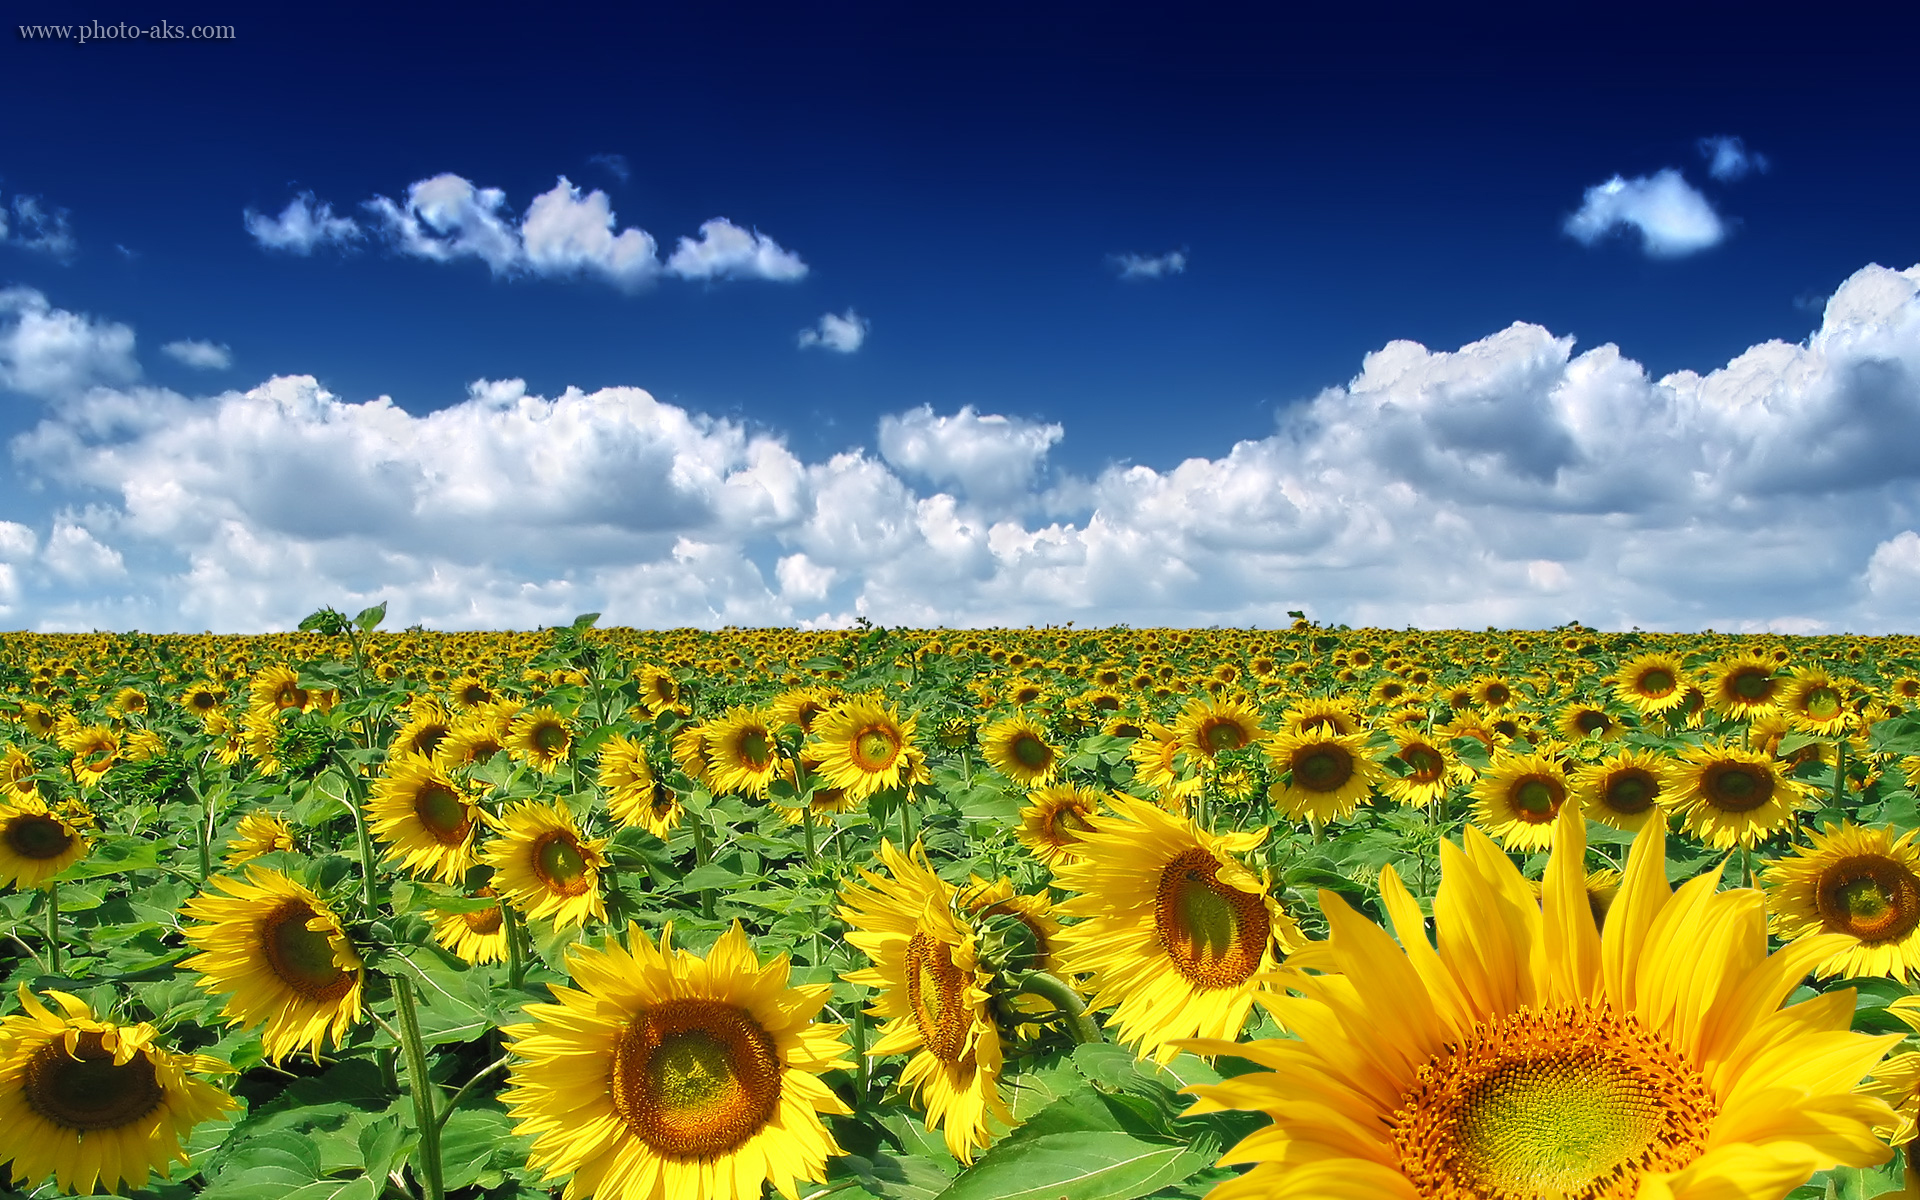 گل آفتابگردان - مزرعه-گل-آفتابگردان